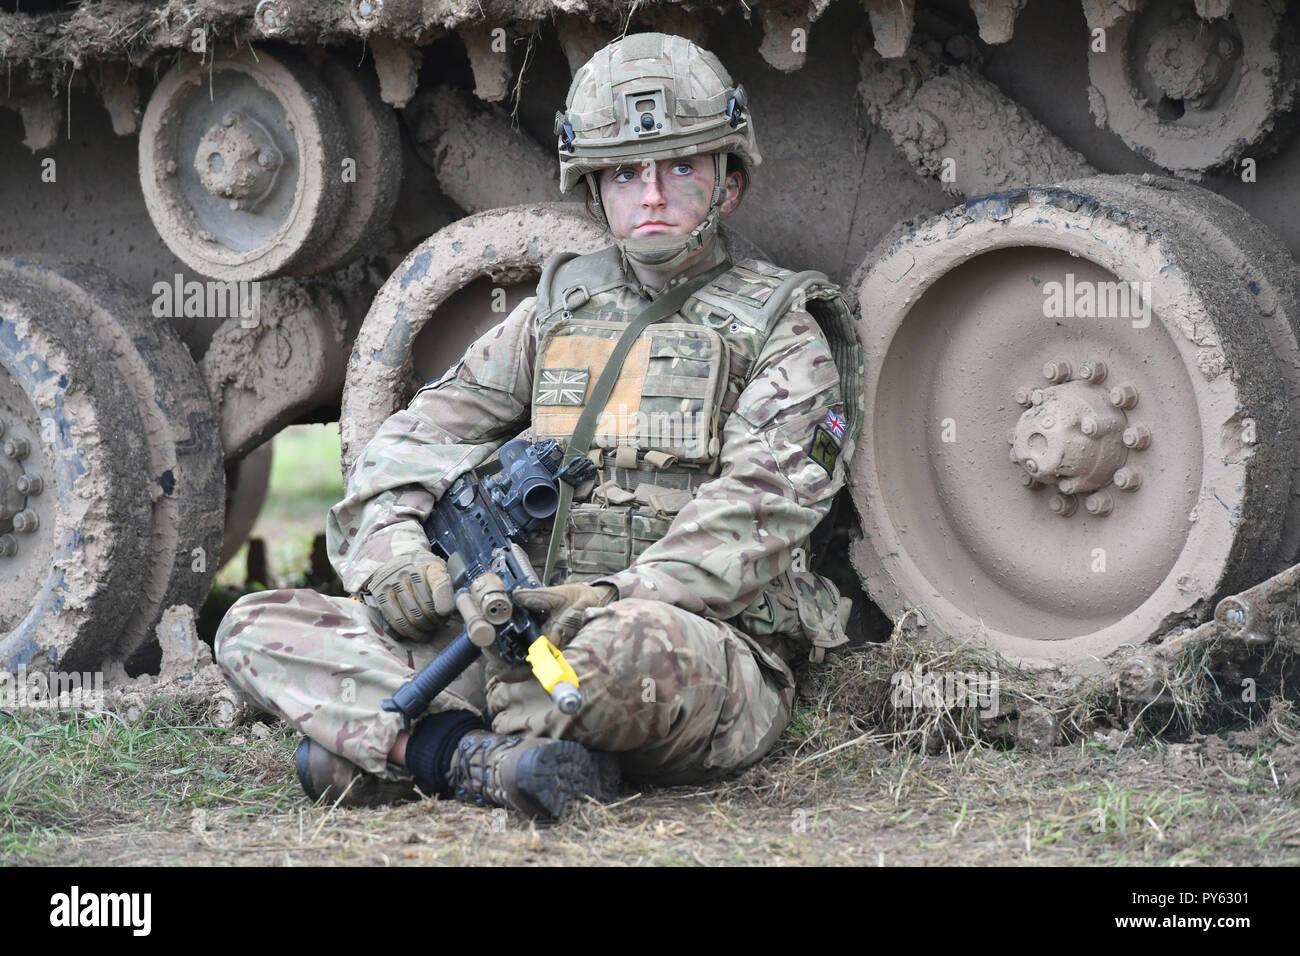 bada87e8ad3 The Royal Army Veterinary Corps Stock Photos   The Royal Army ...